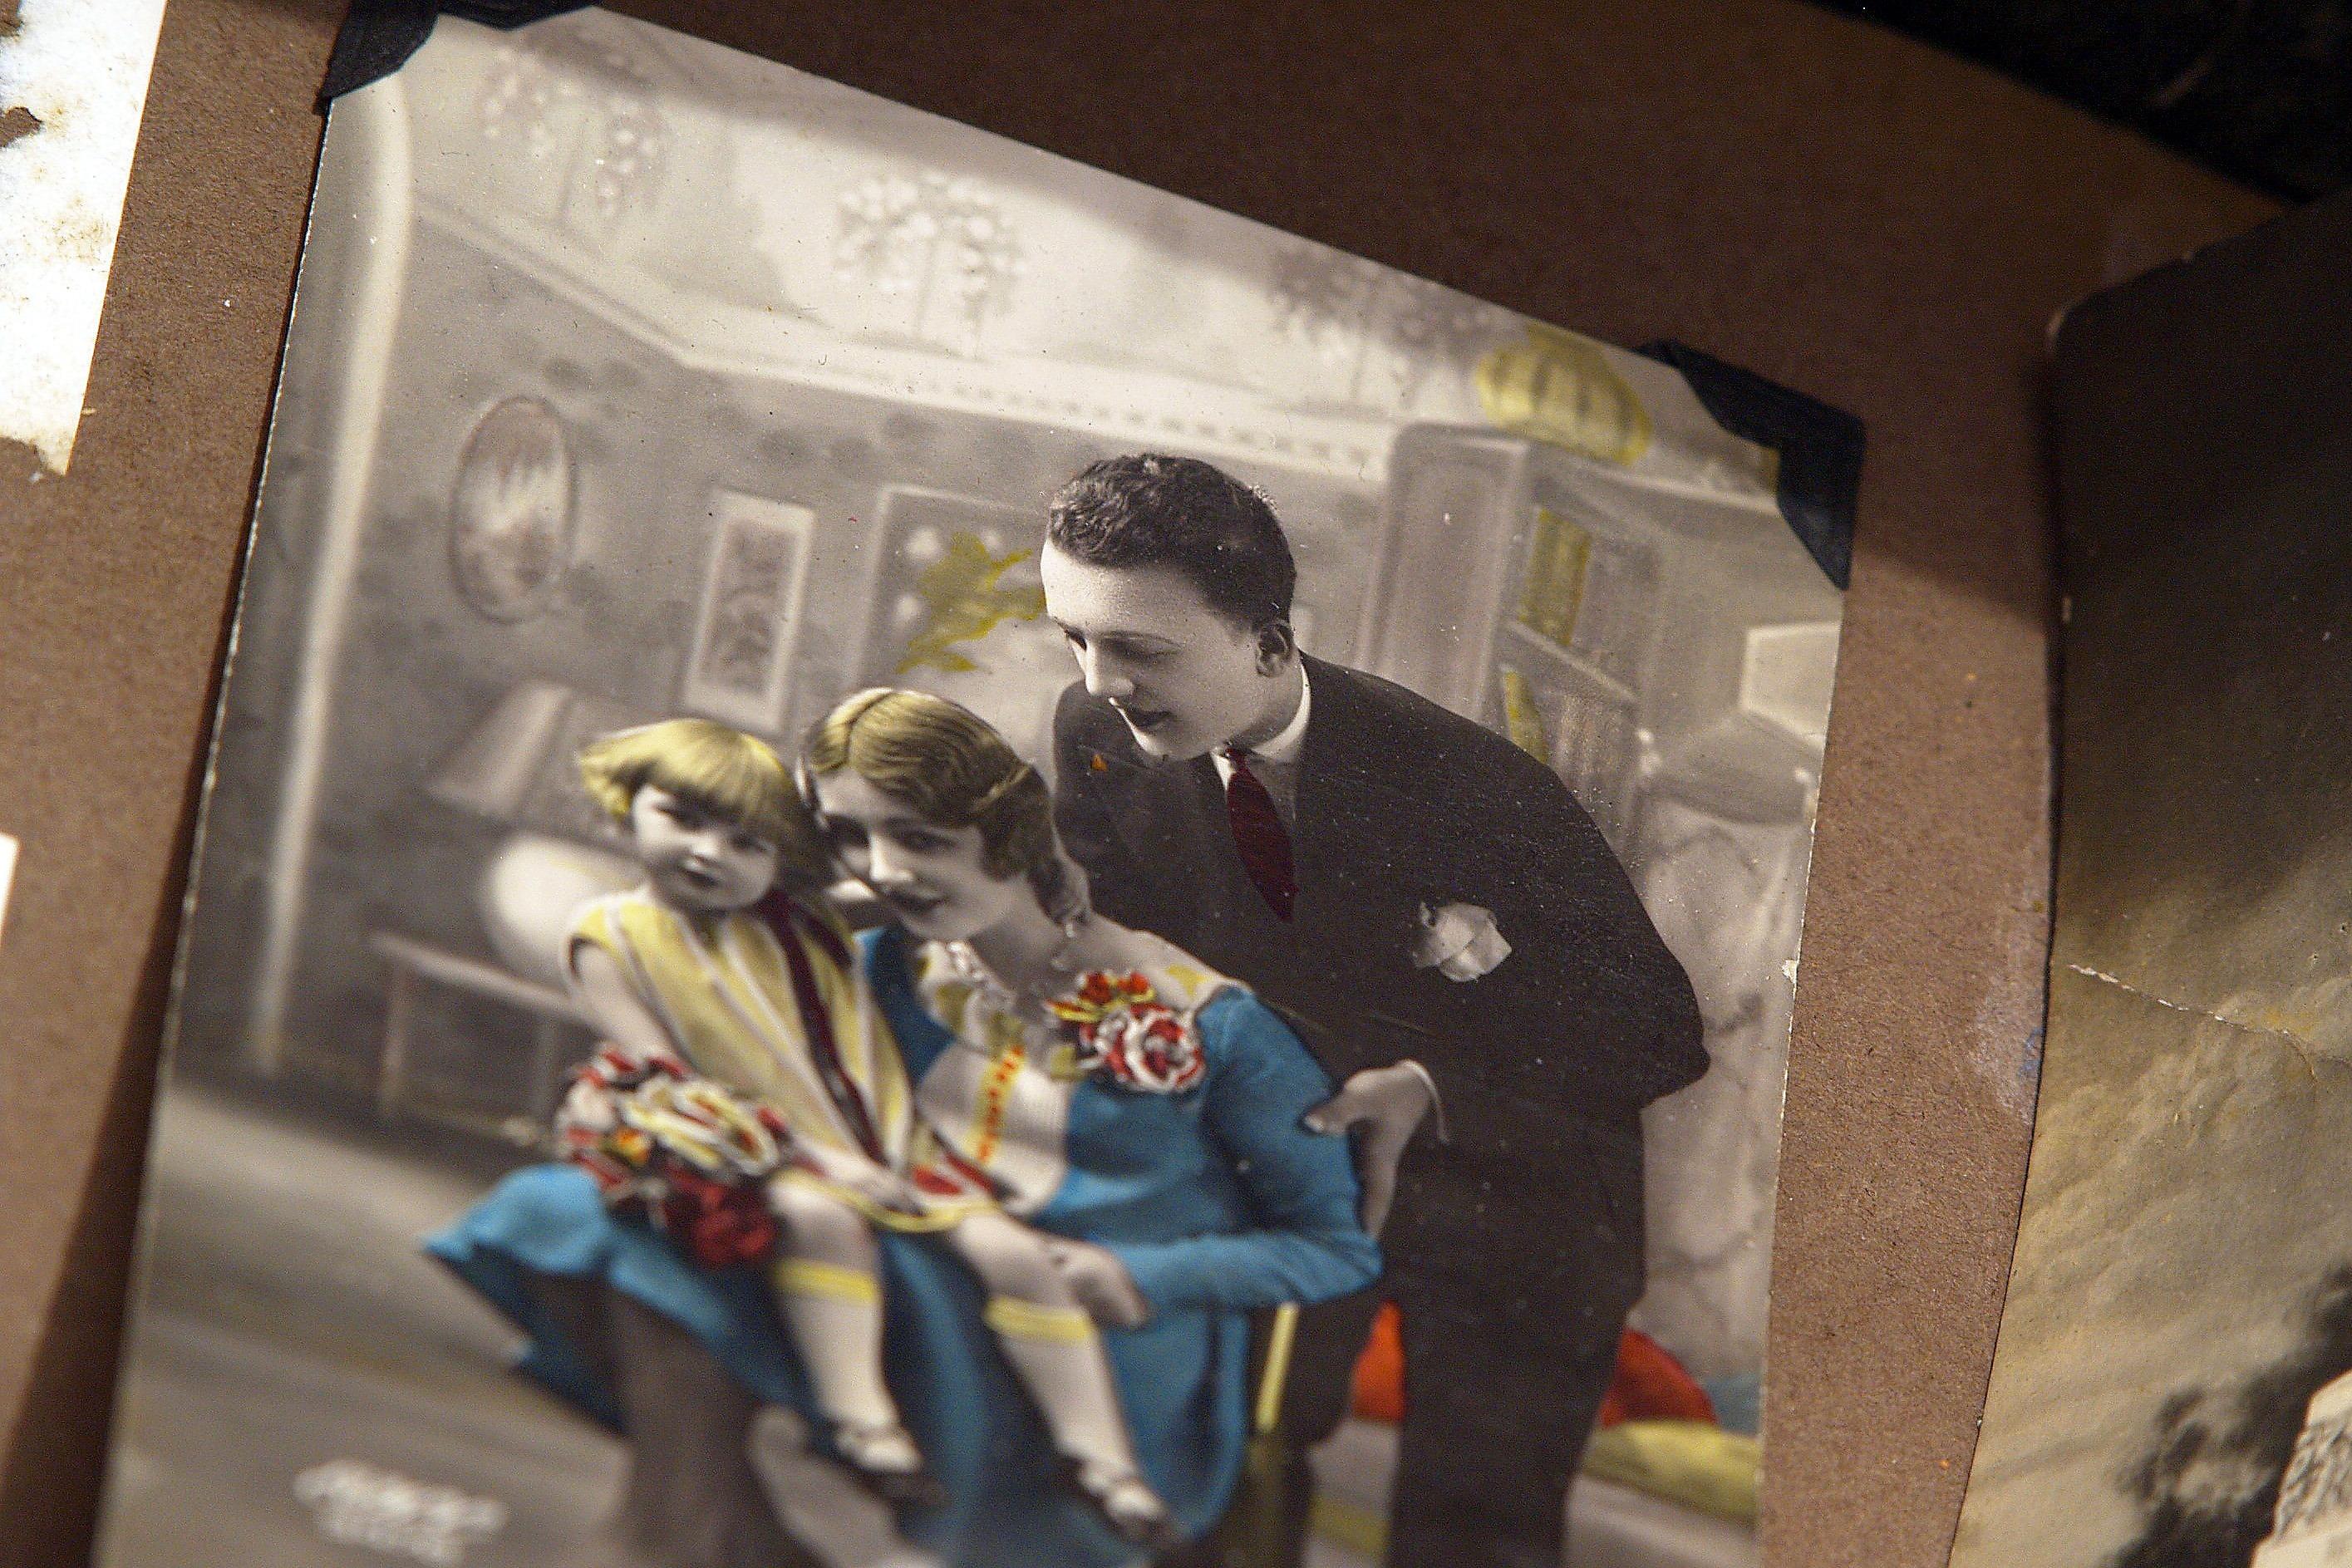 Fotos gratis : fotografía, vendimia, antiguo, foto, marco, nostalgia ...